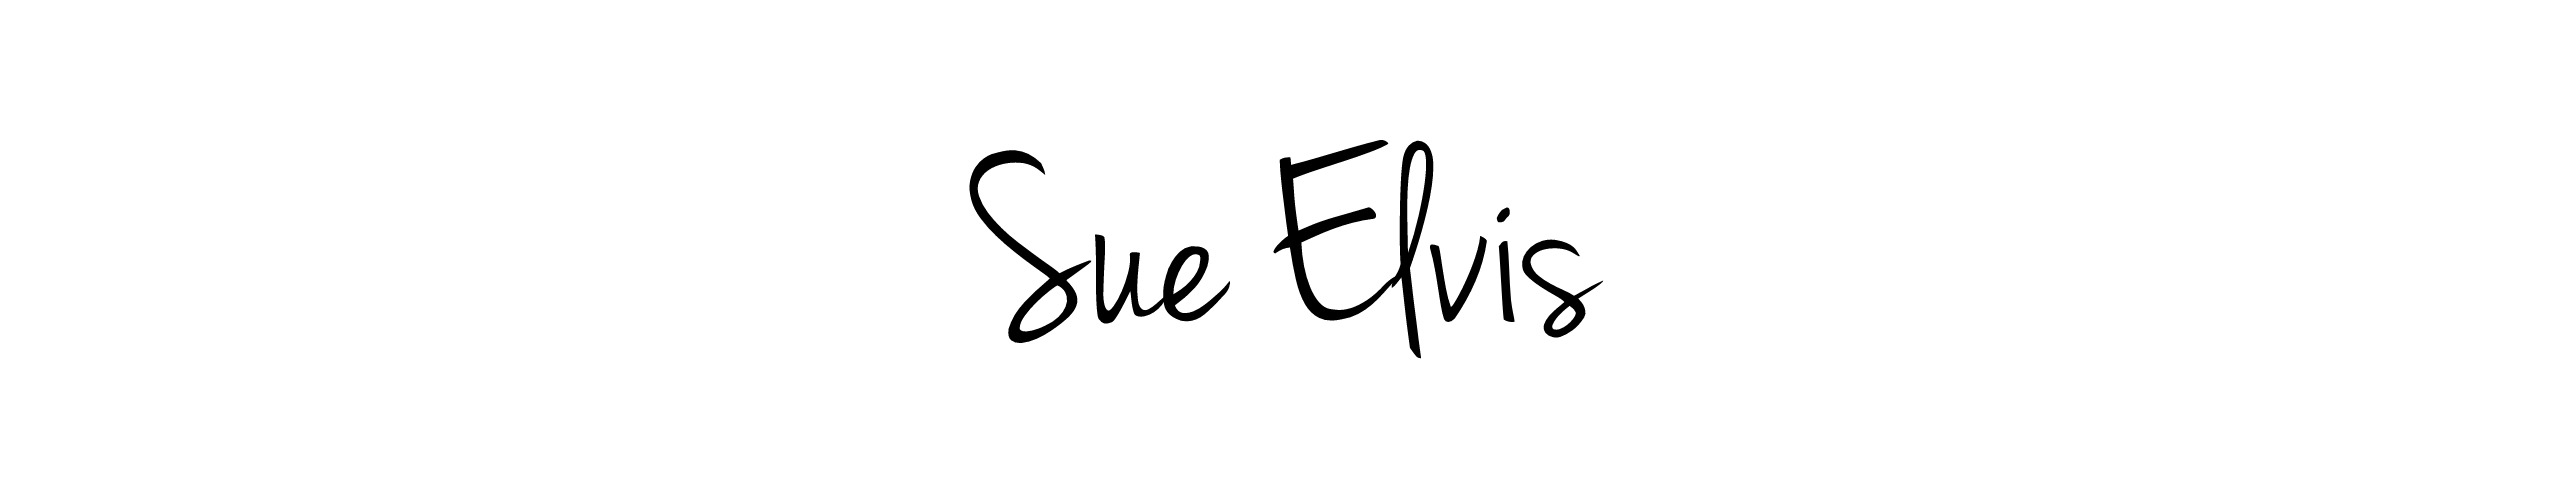 Sue Elvis